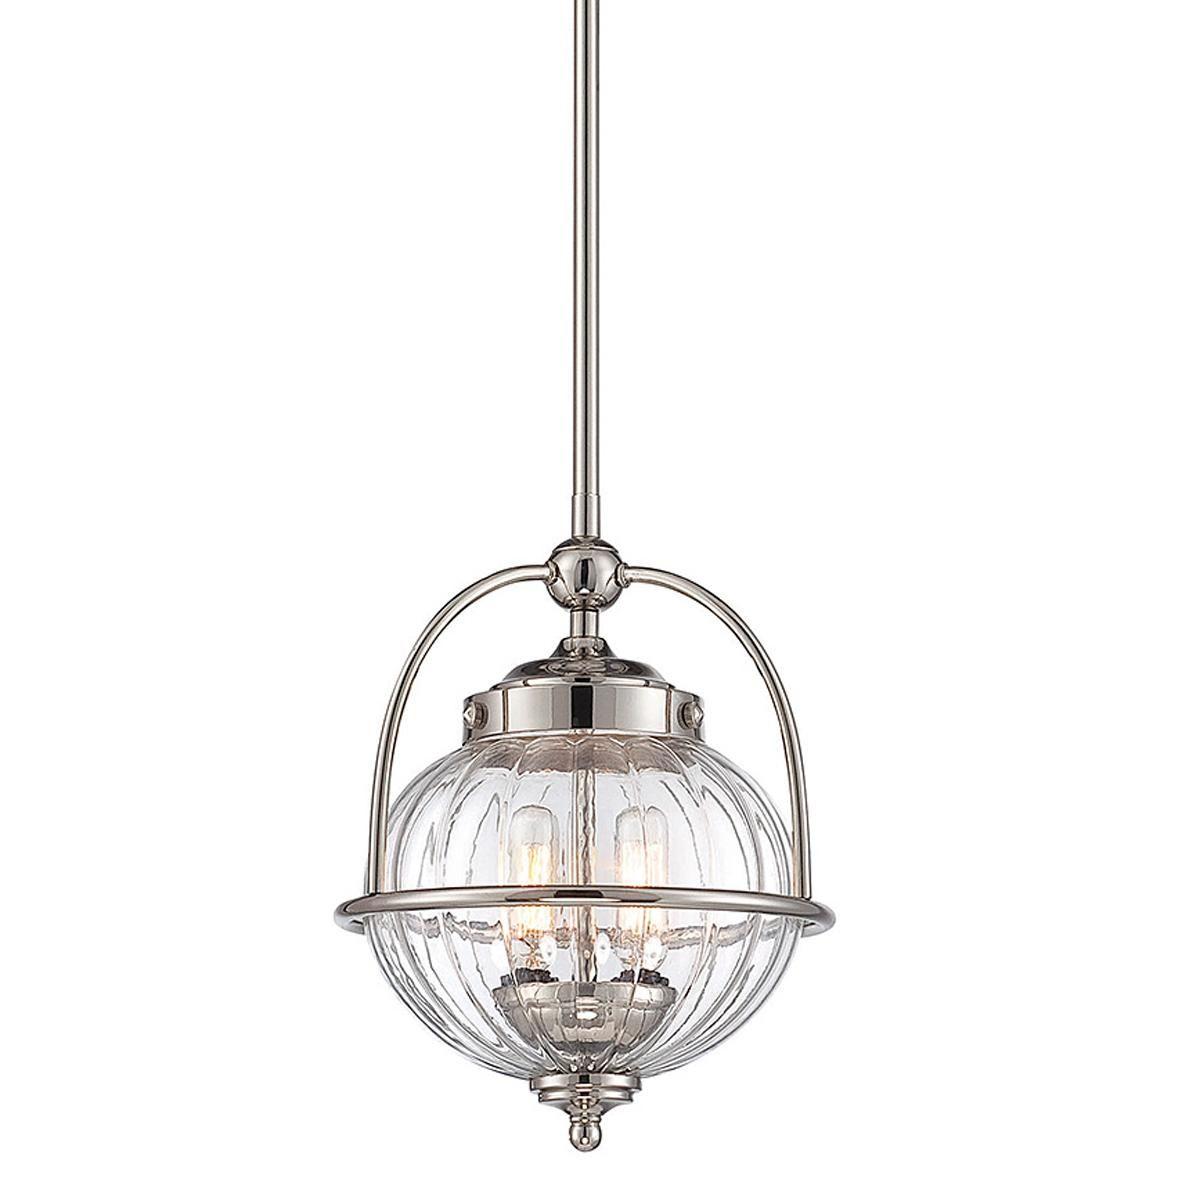 Nautical Light Fixtures Kitchen: Nautical Lantern Style Pendant - Small In 2019